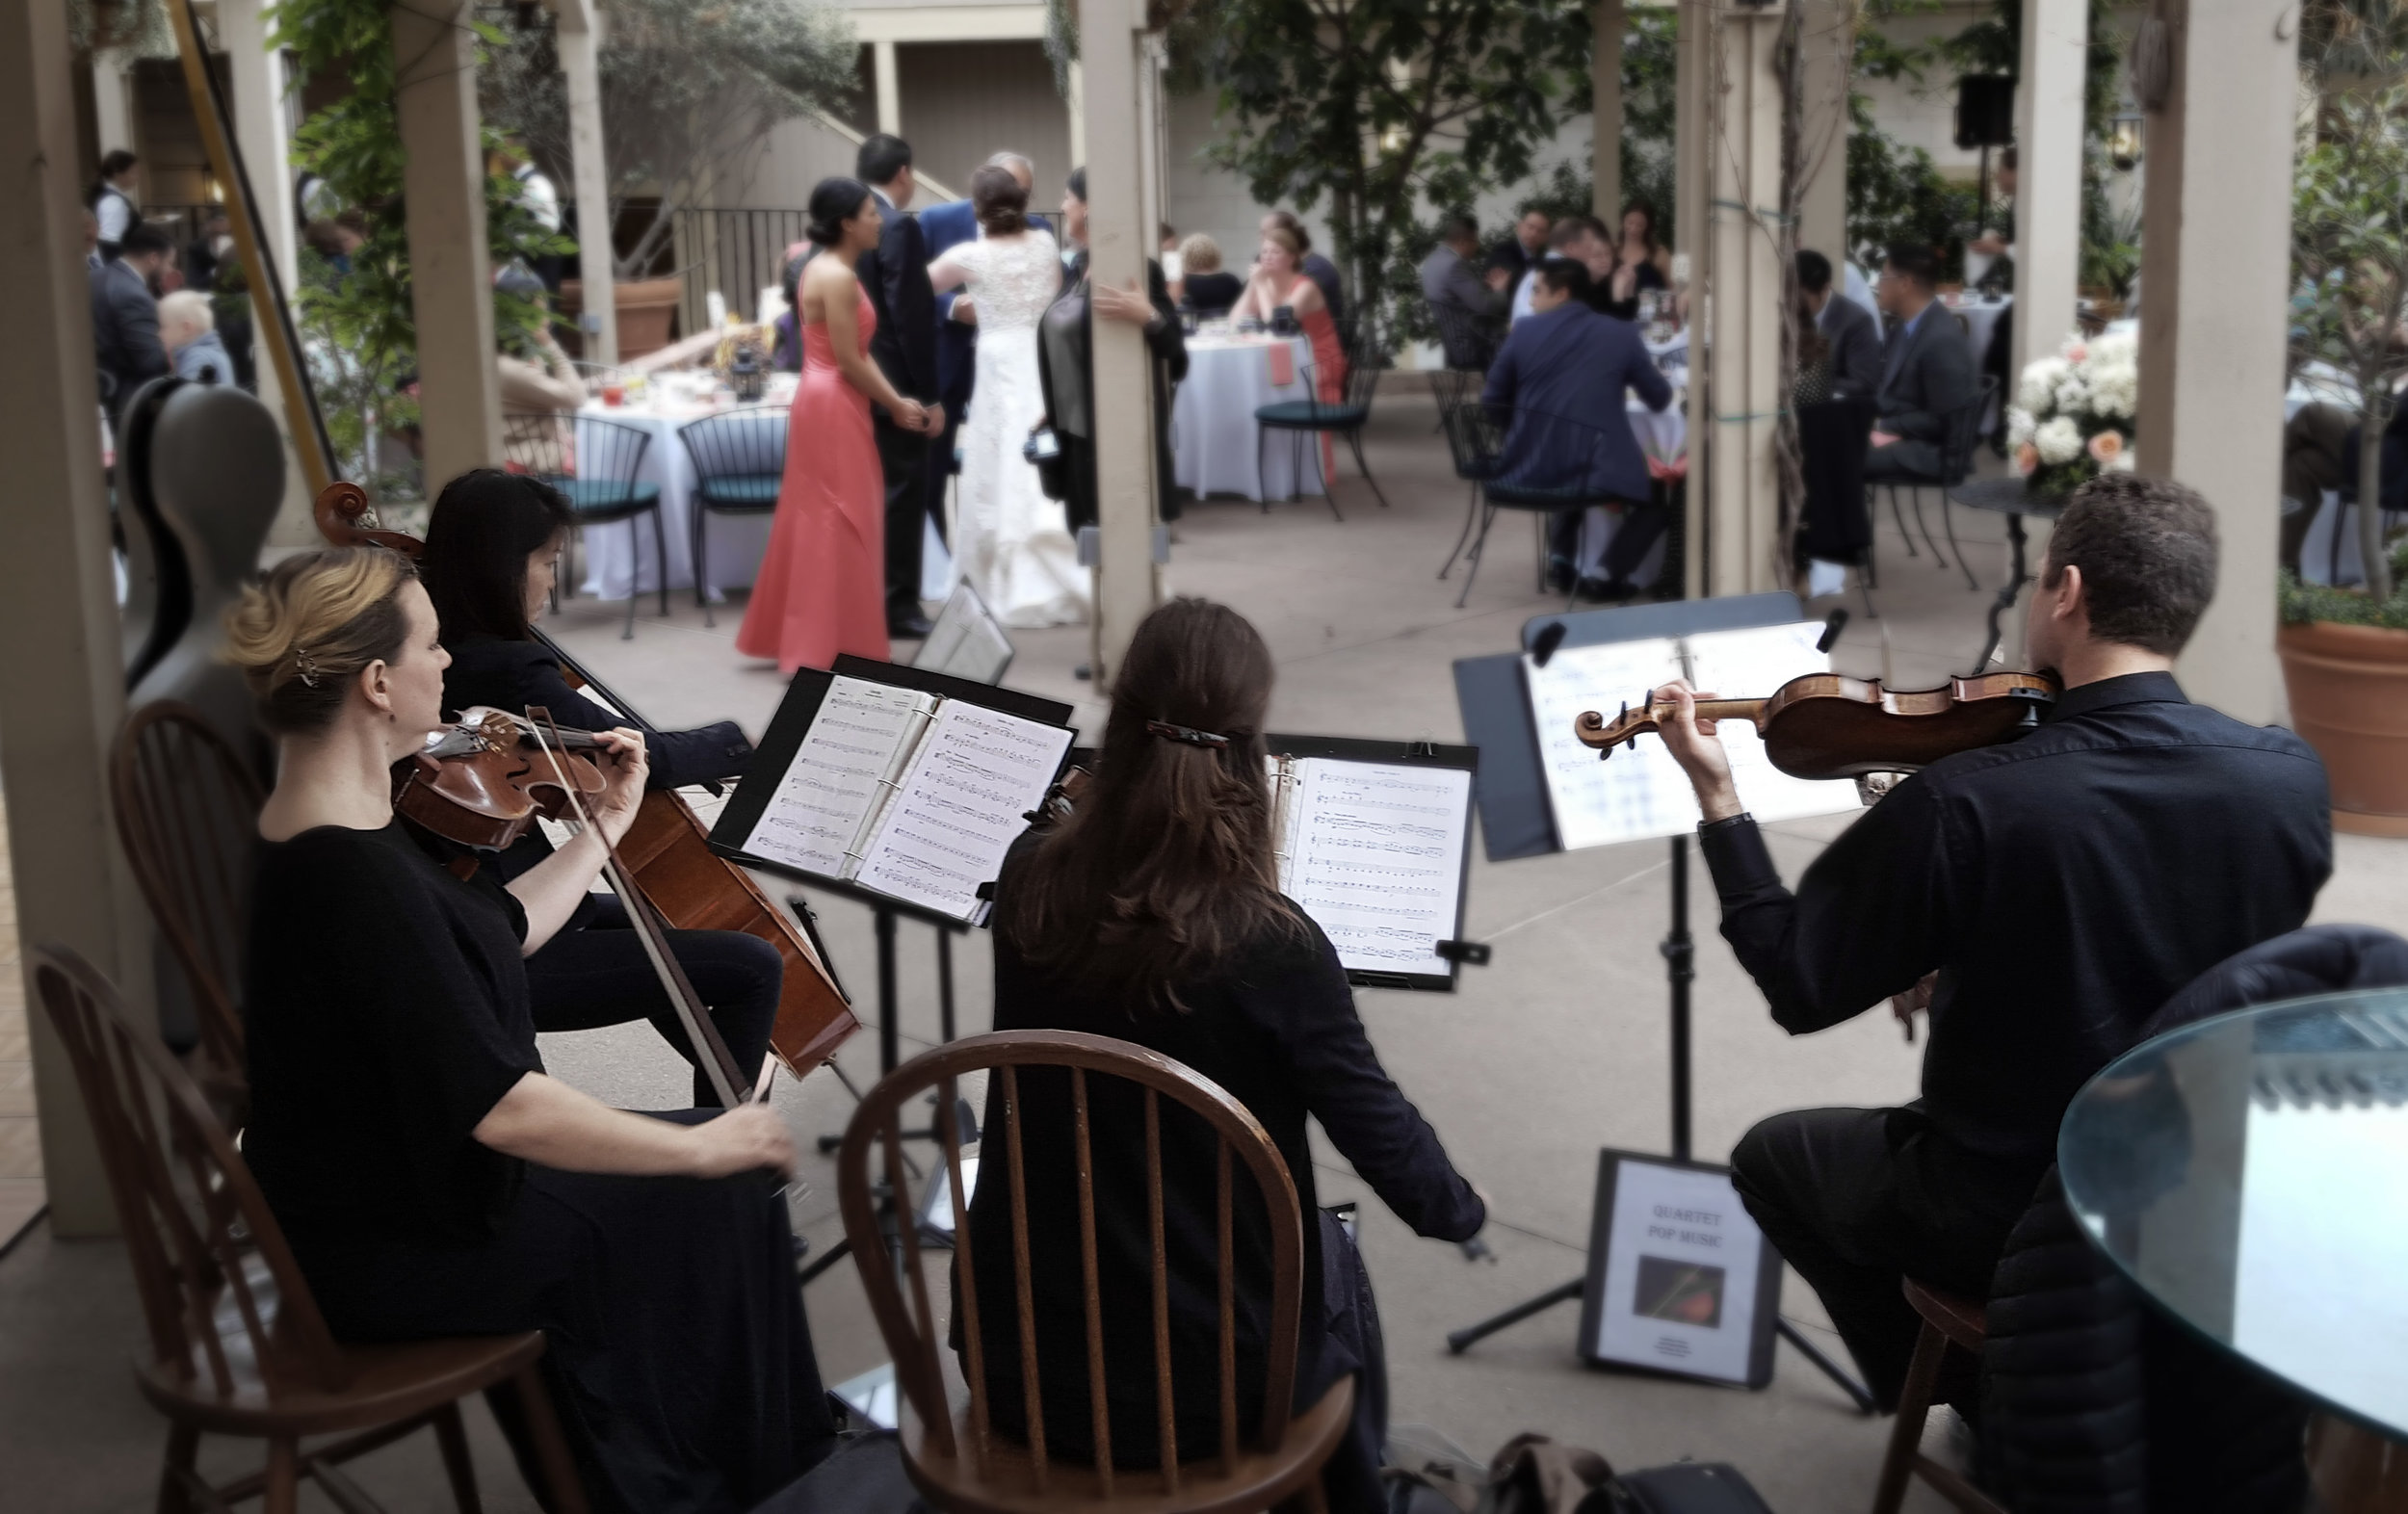 string_quartet_wedding_reception.jpg